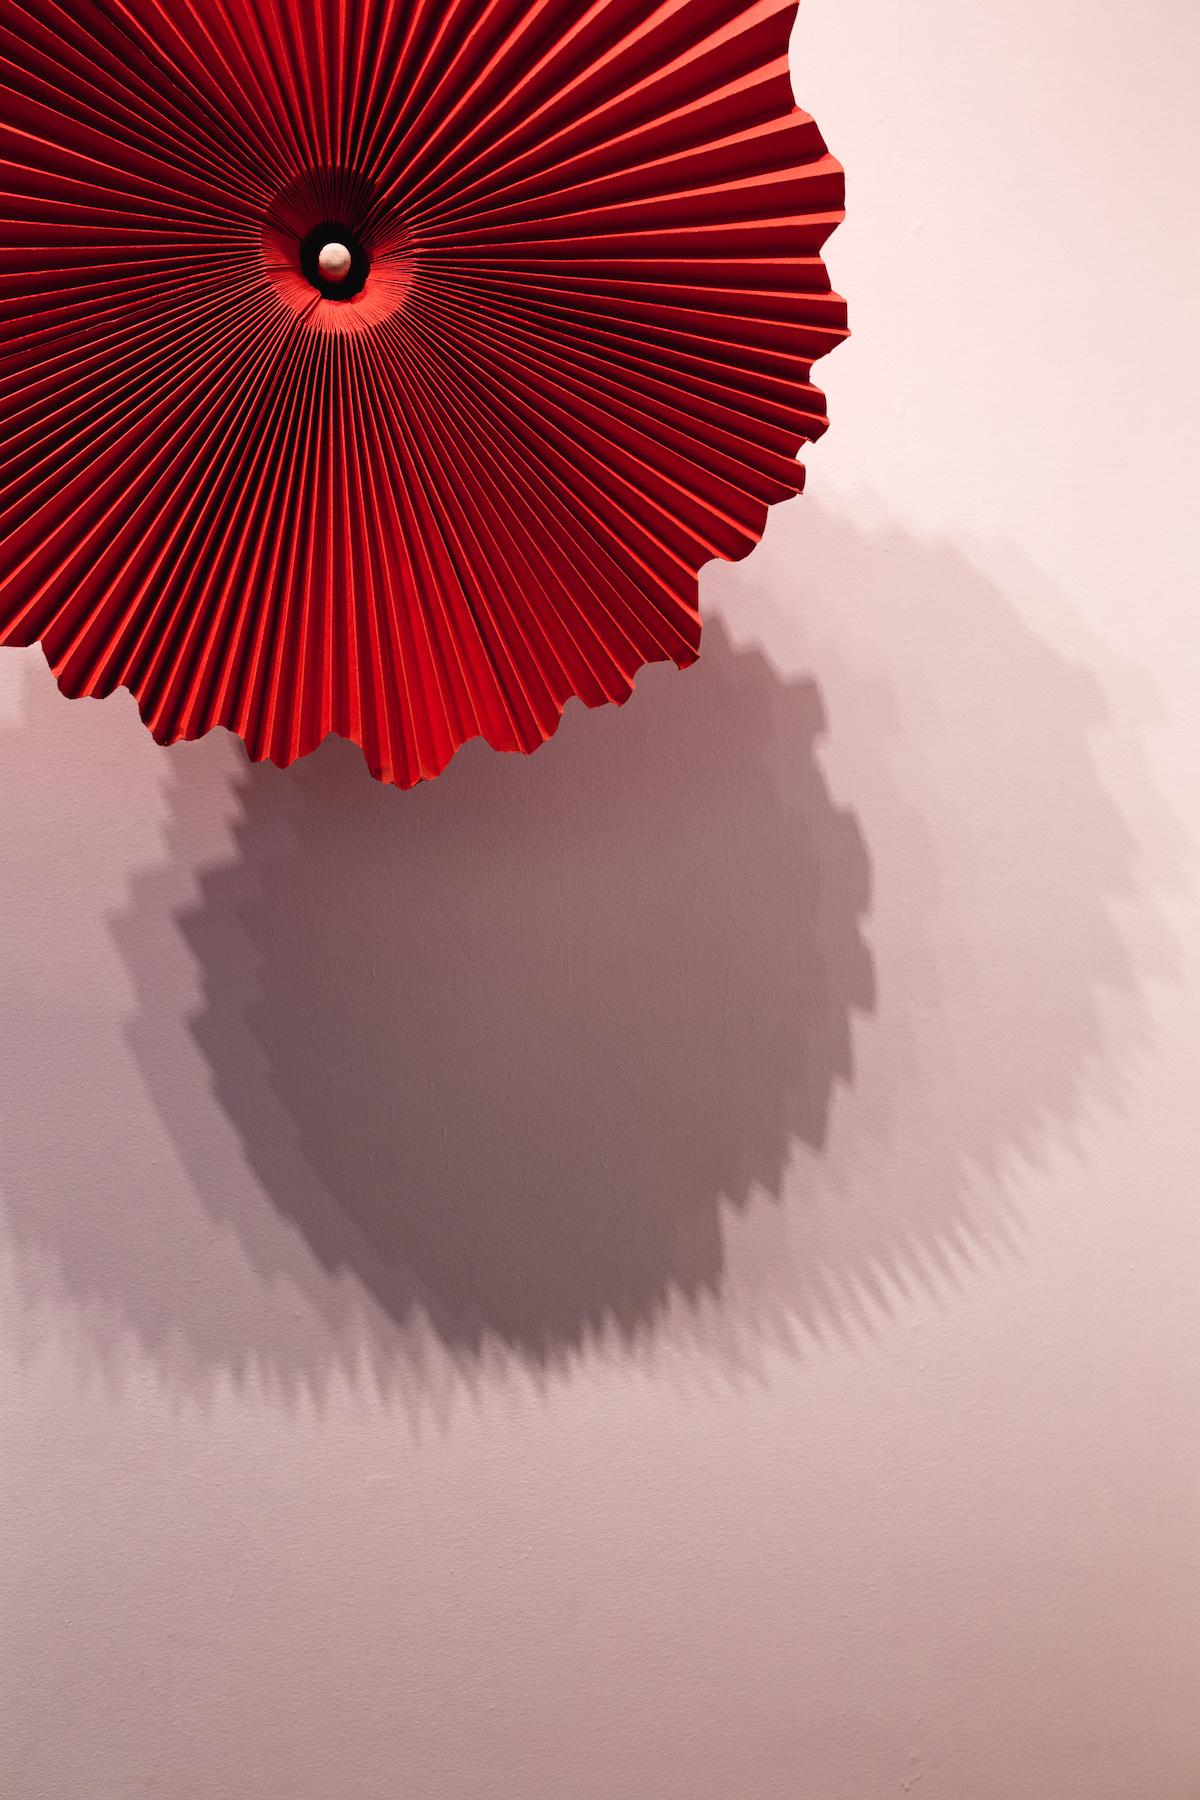 miss-cloudy-pauline-loctin-plie-project-melika-dez-ausgang-exhibition-paper-art-origami-ballerina-ballet-dancer-pointe-fold-23.jpg